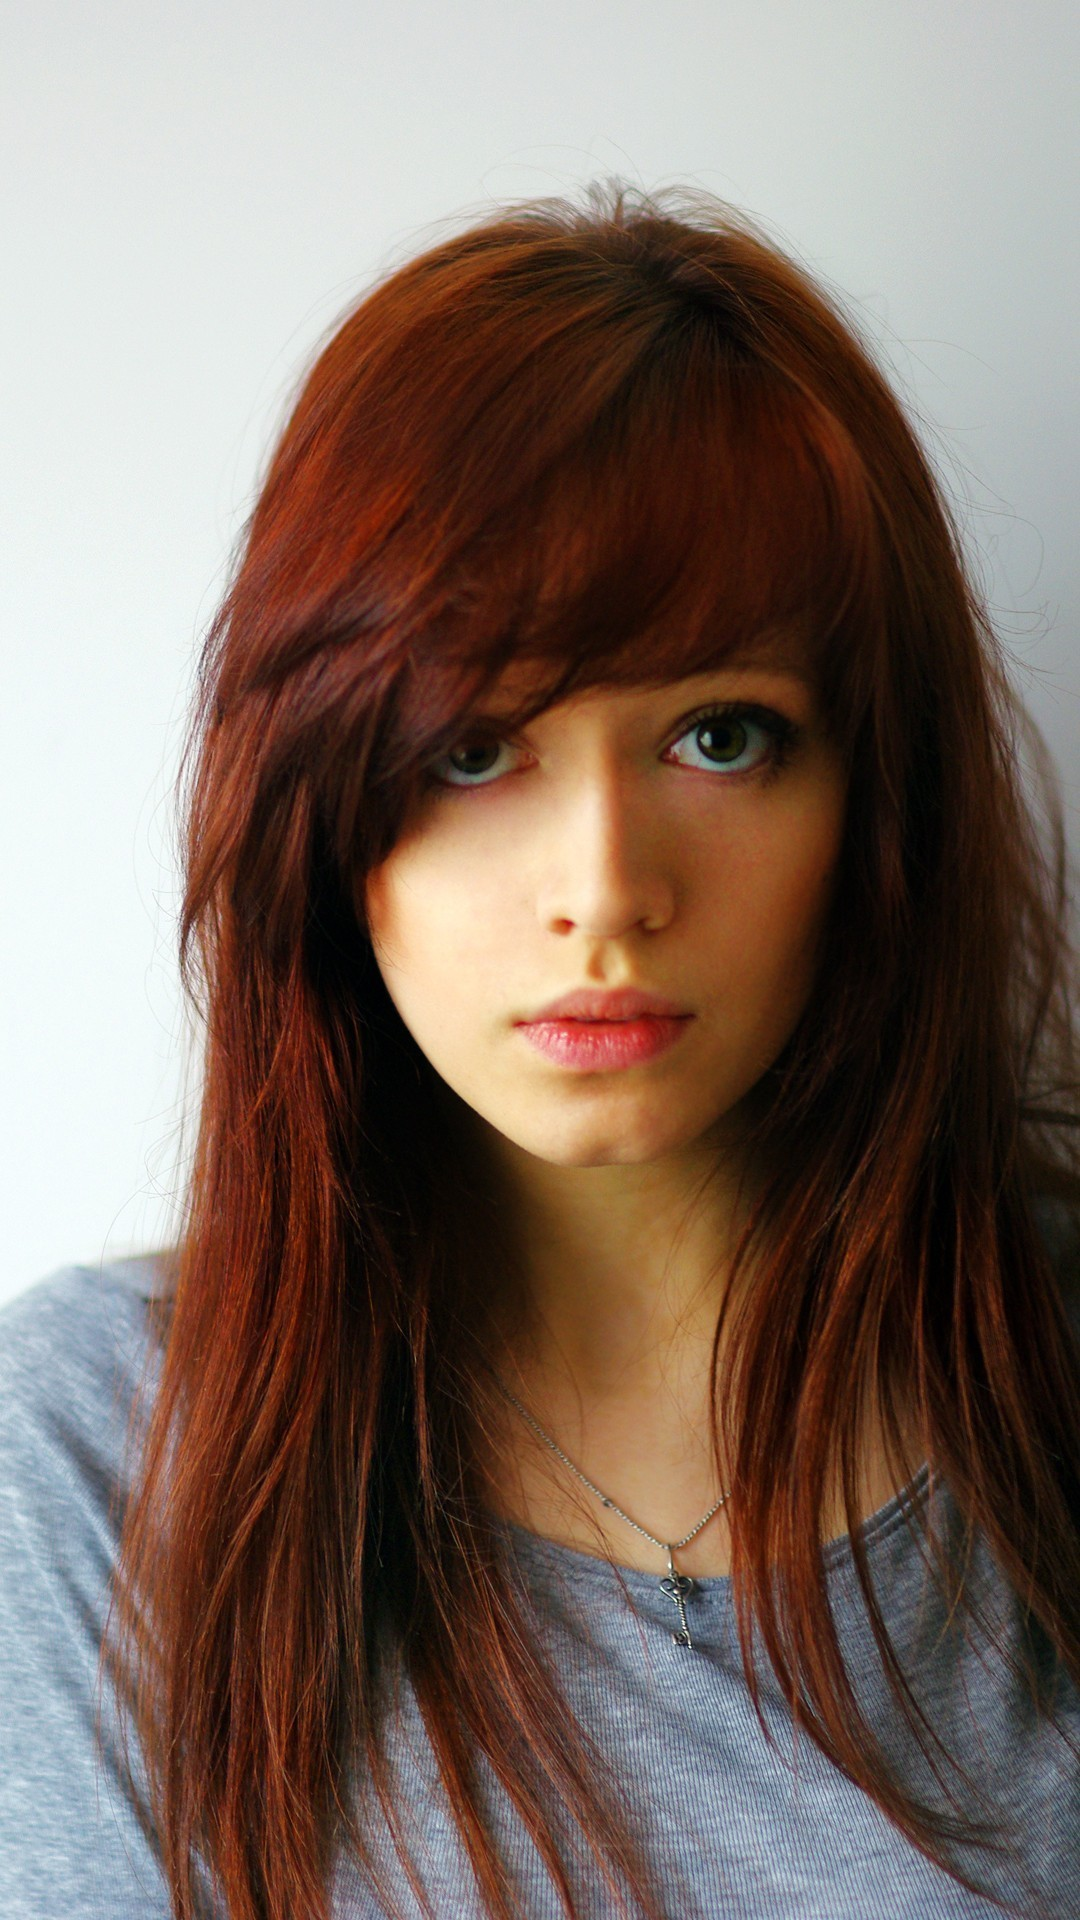 … Gorgeous redhead Girl mobile wallpaper